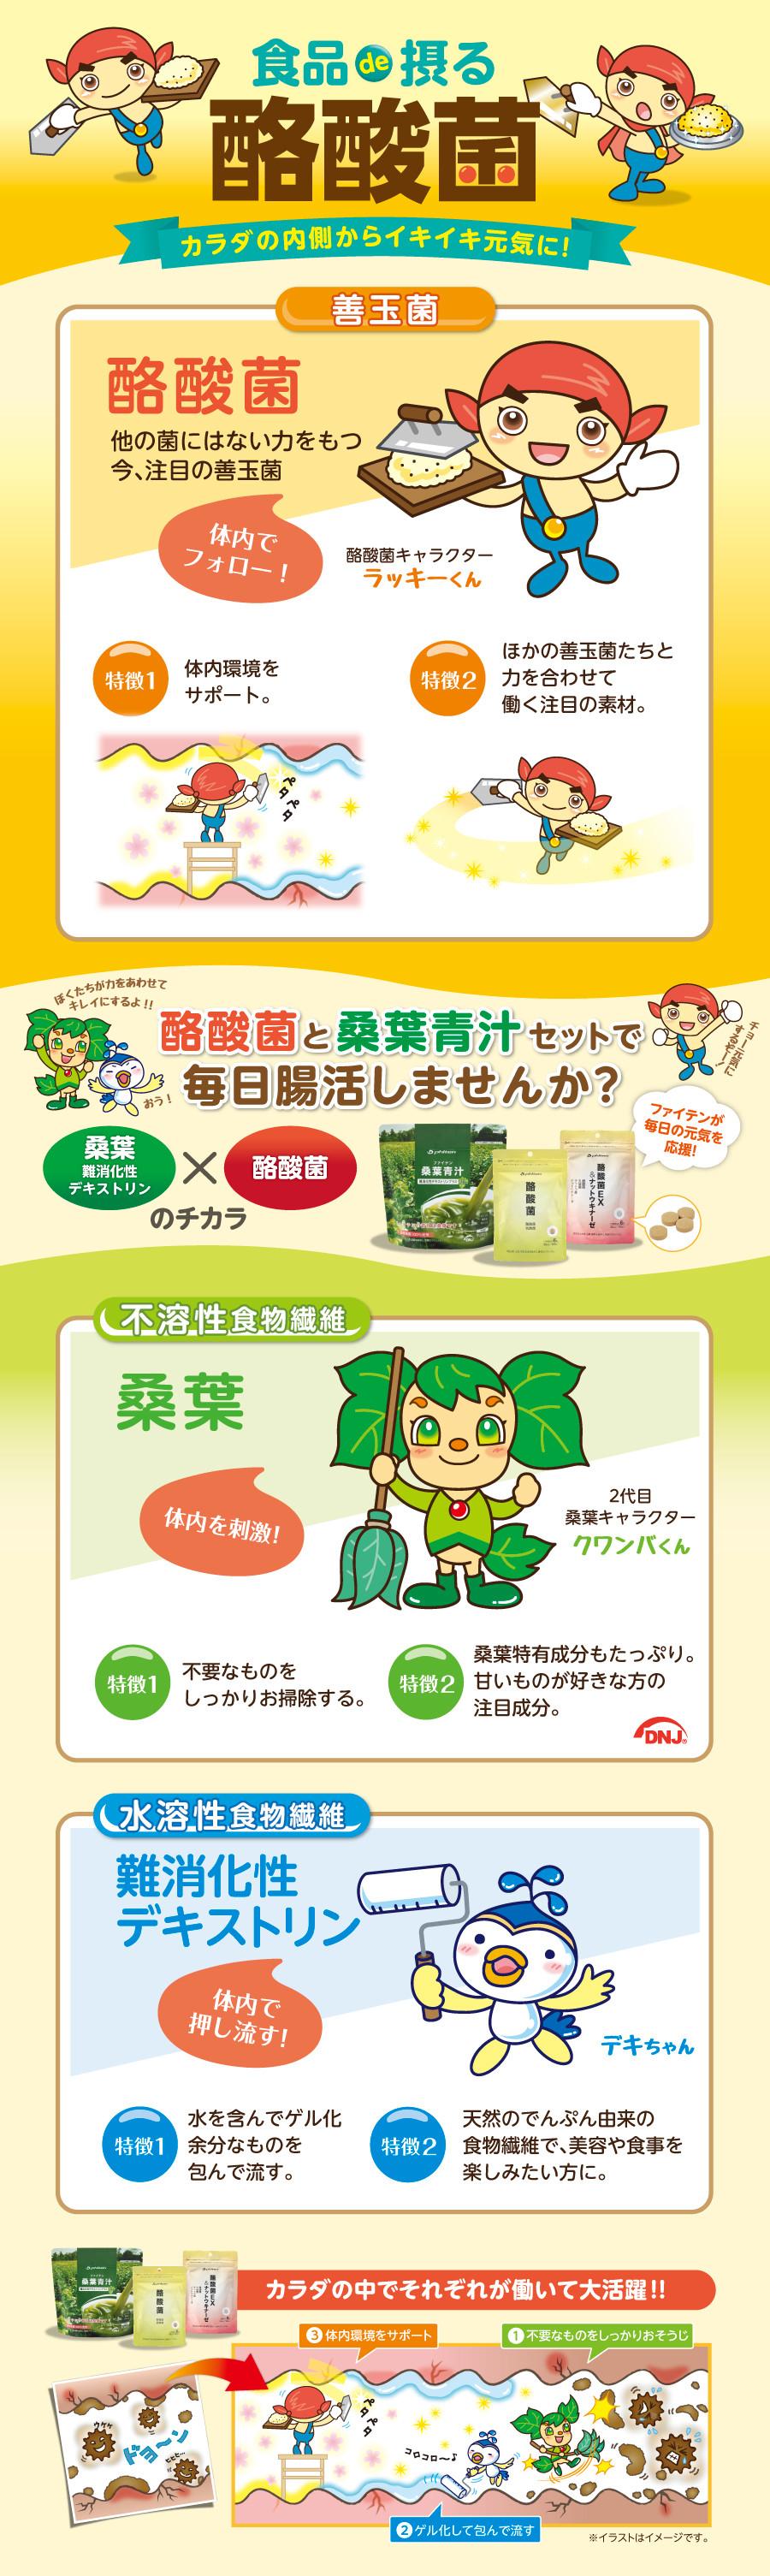 choukatsu_fair_1910_img05_sp.jpg